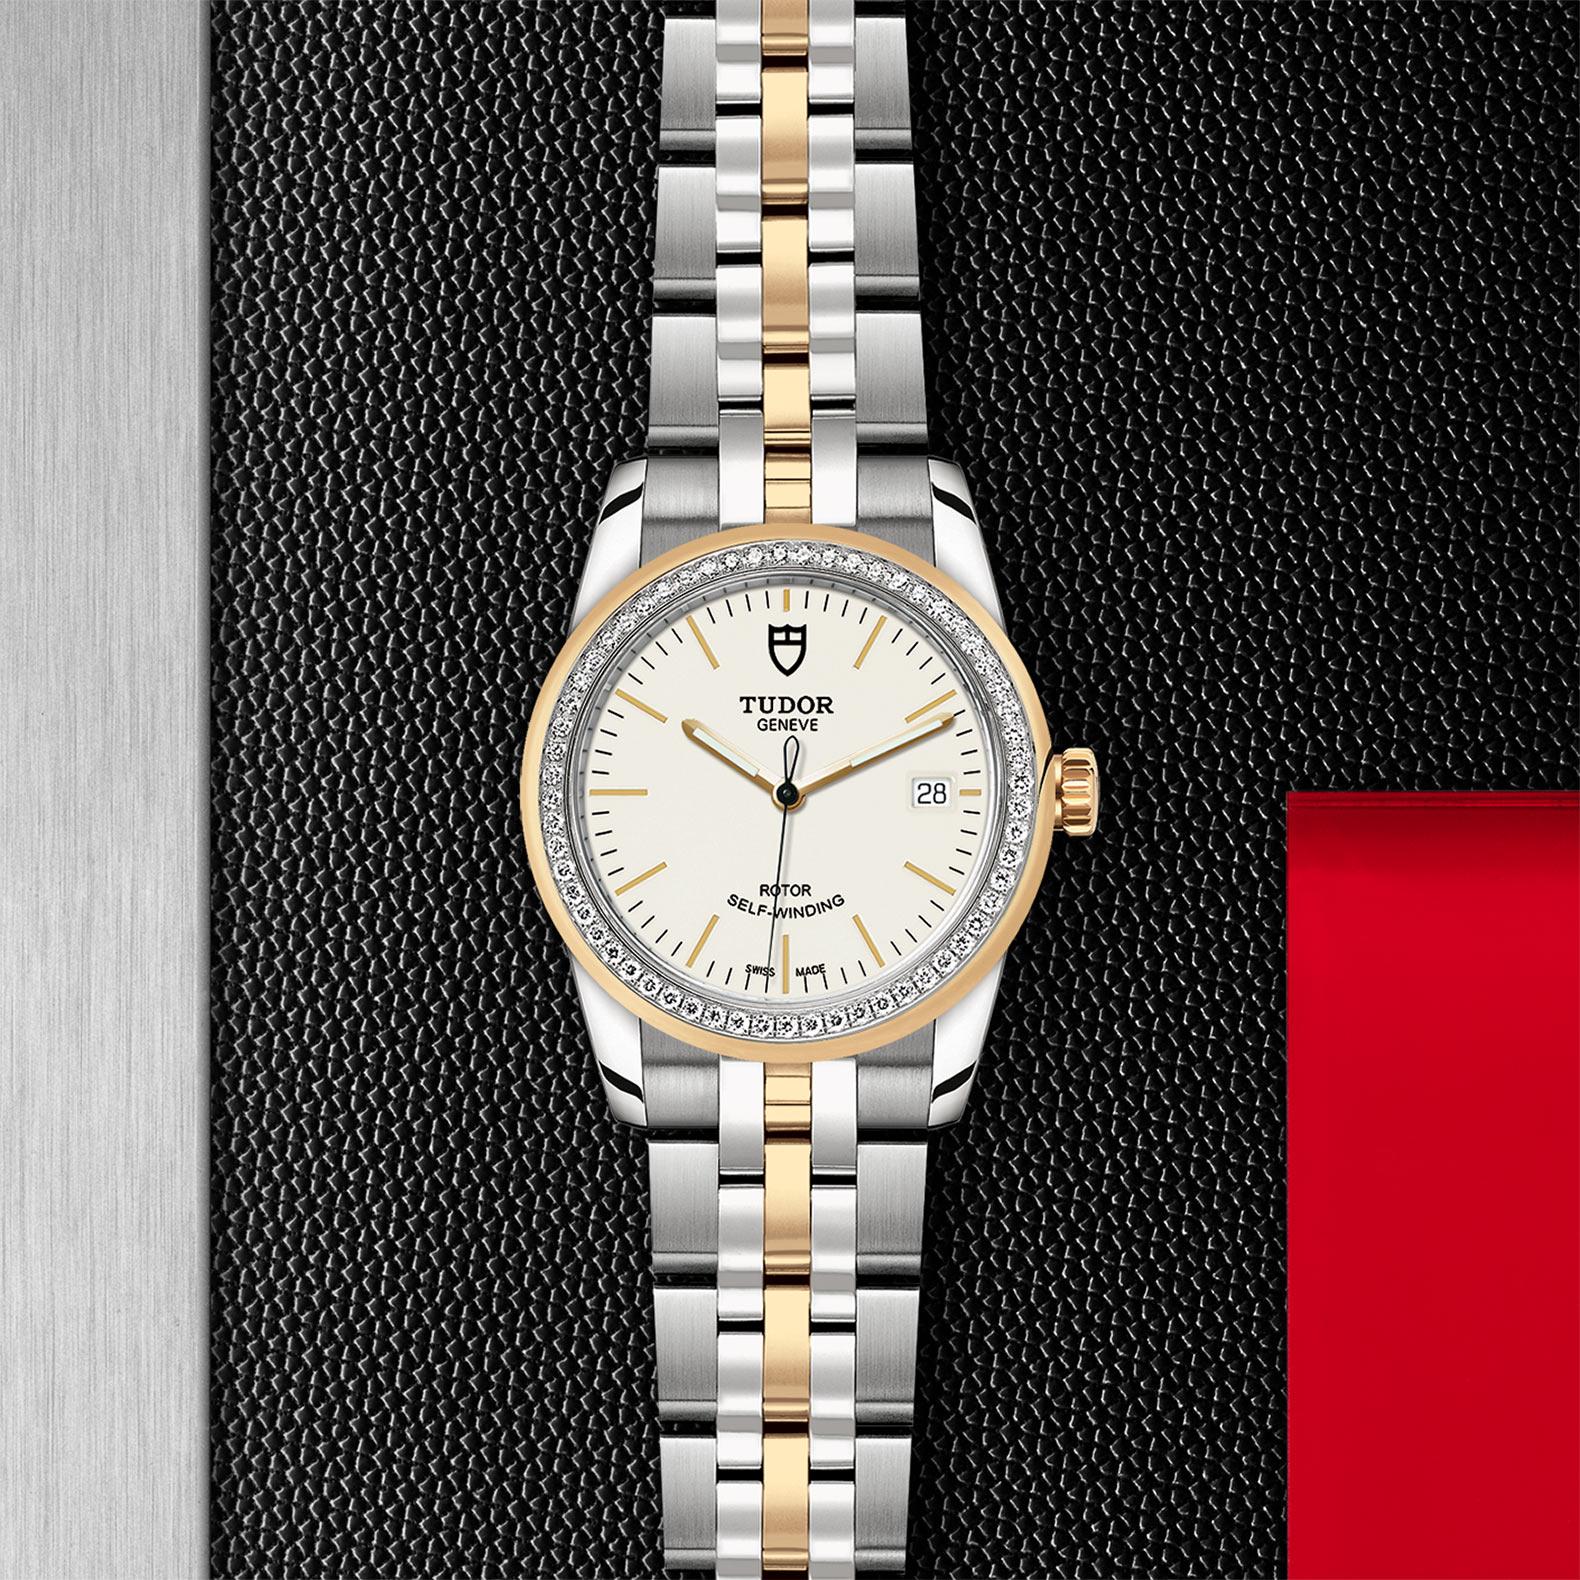 TUDOR Glamour Date - M55023-0081